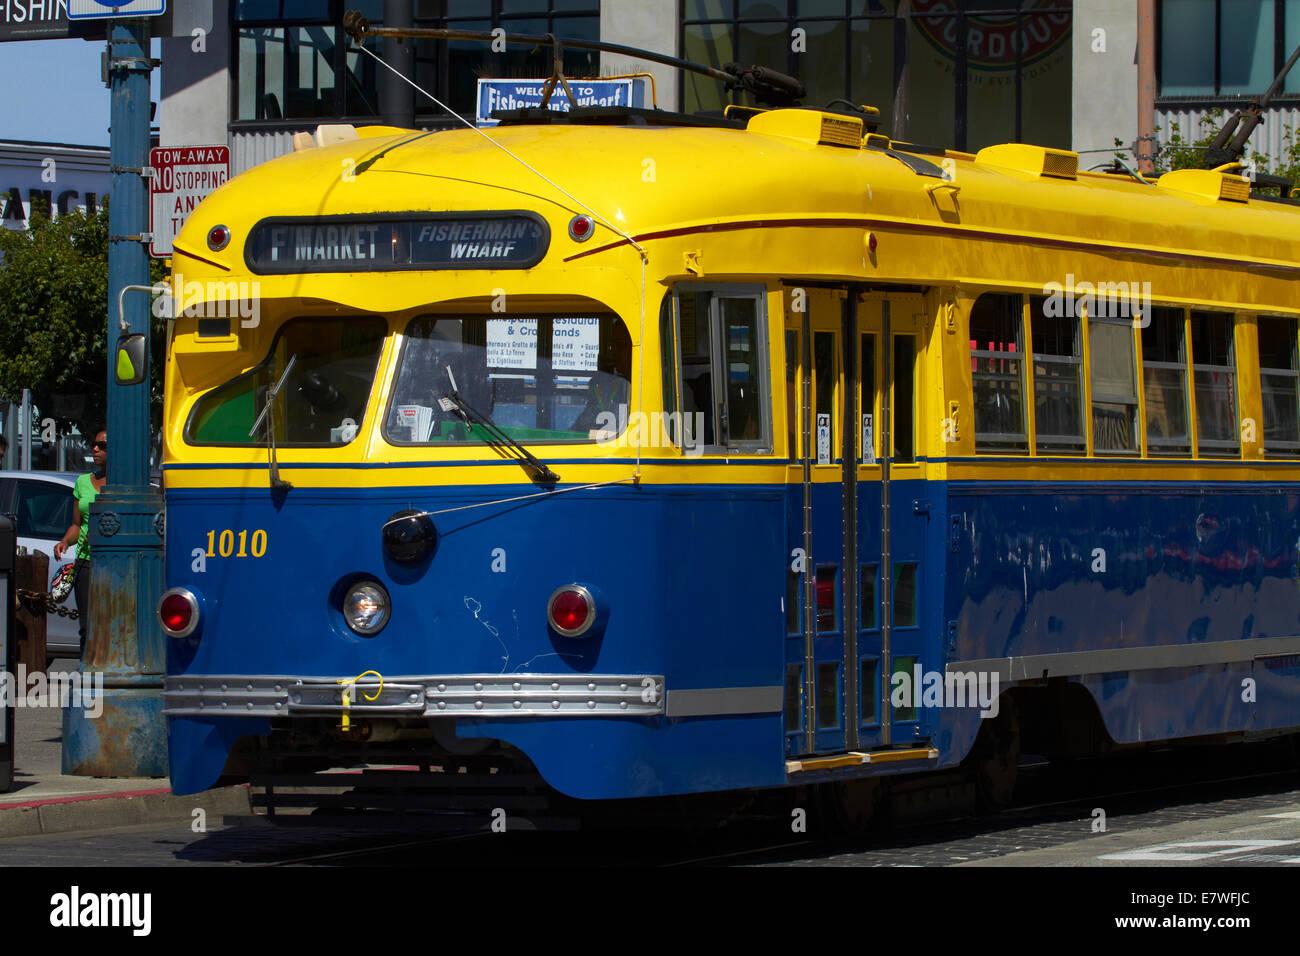 Heritage streetcar, Fishermans Wharf, San Francisco, California, USA - Stock Image